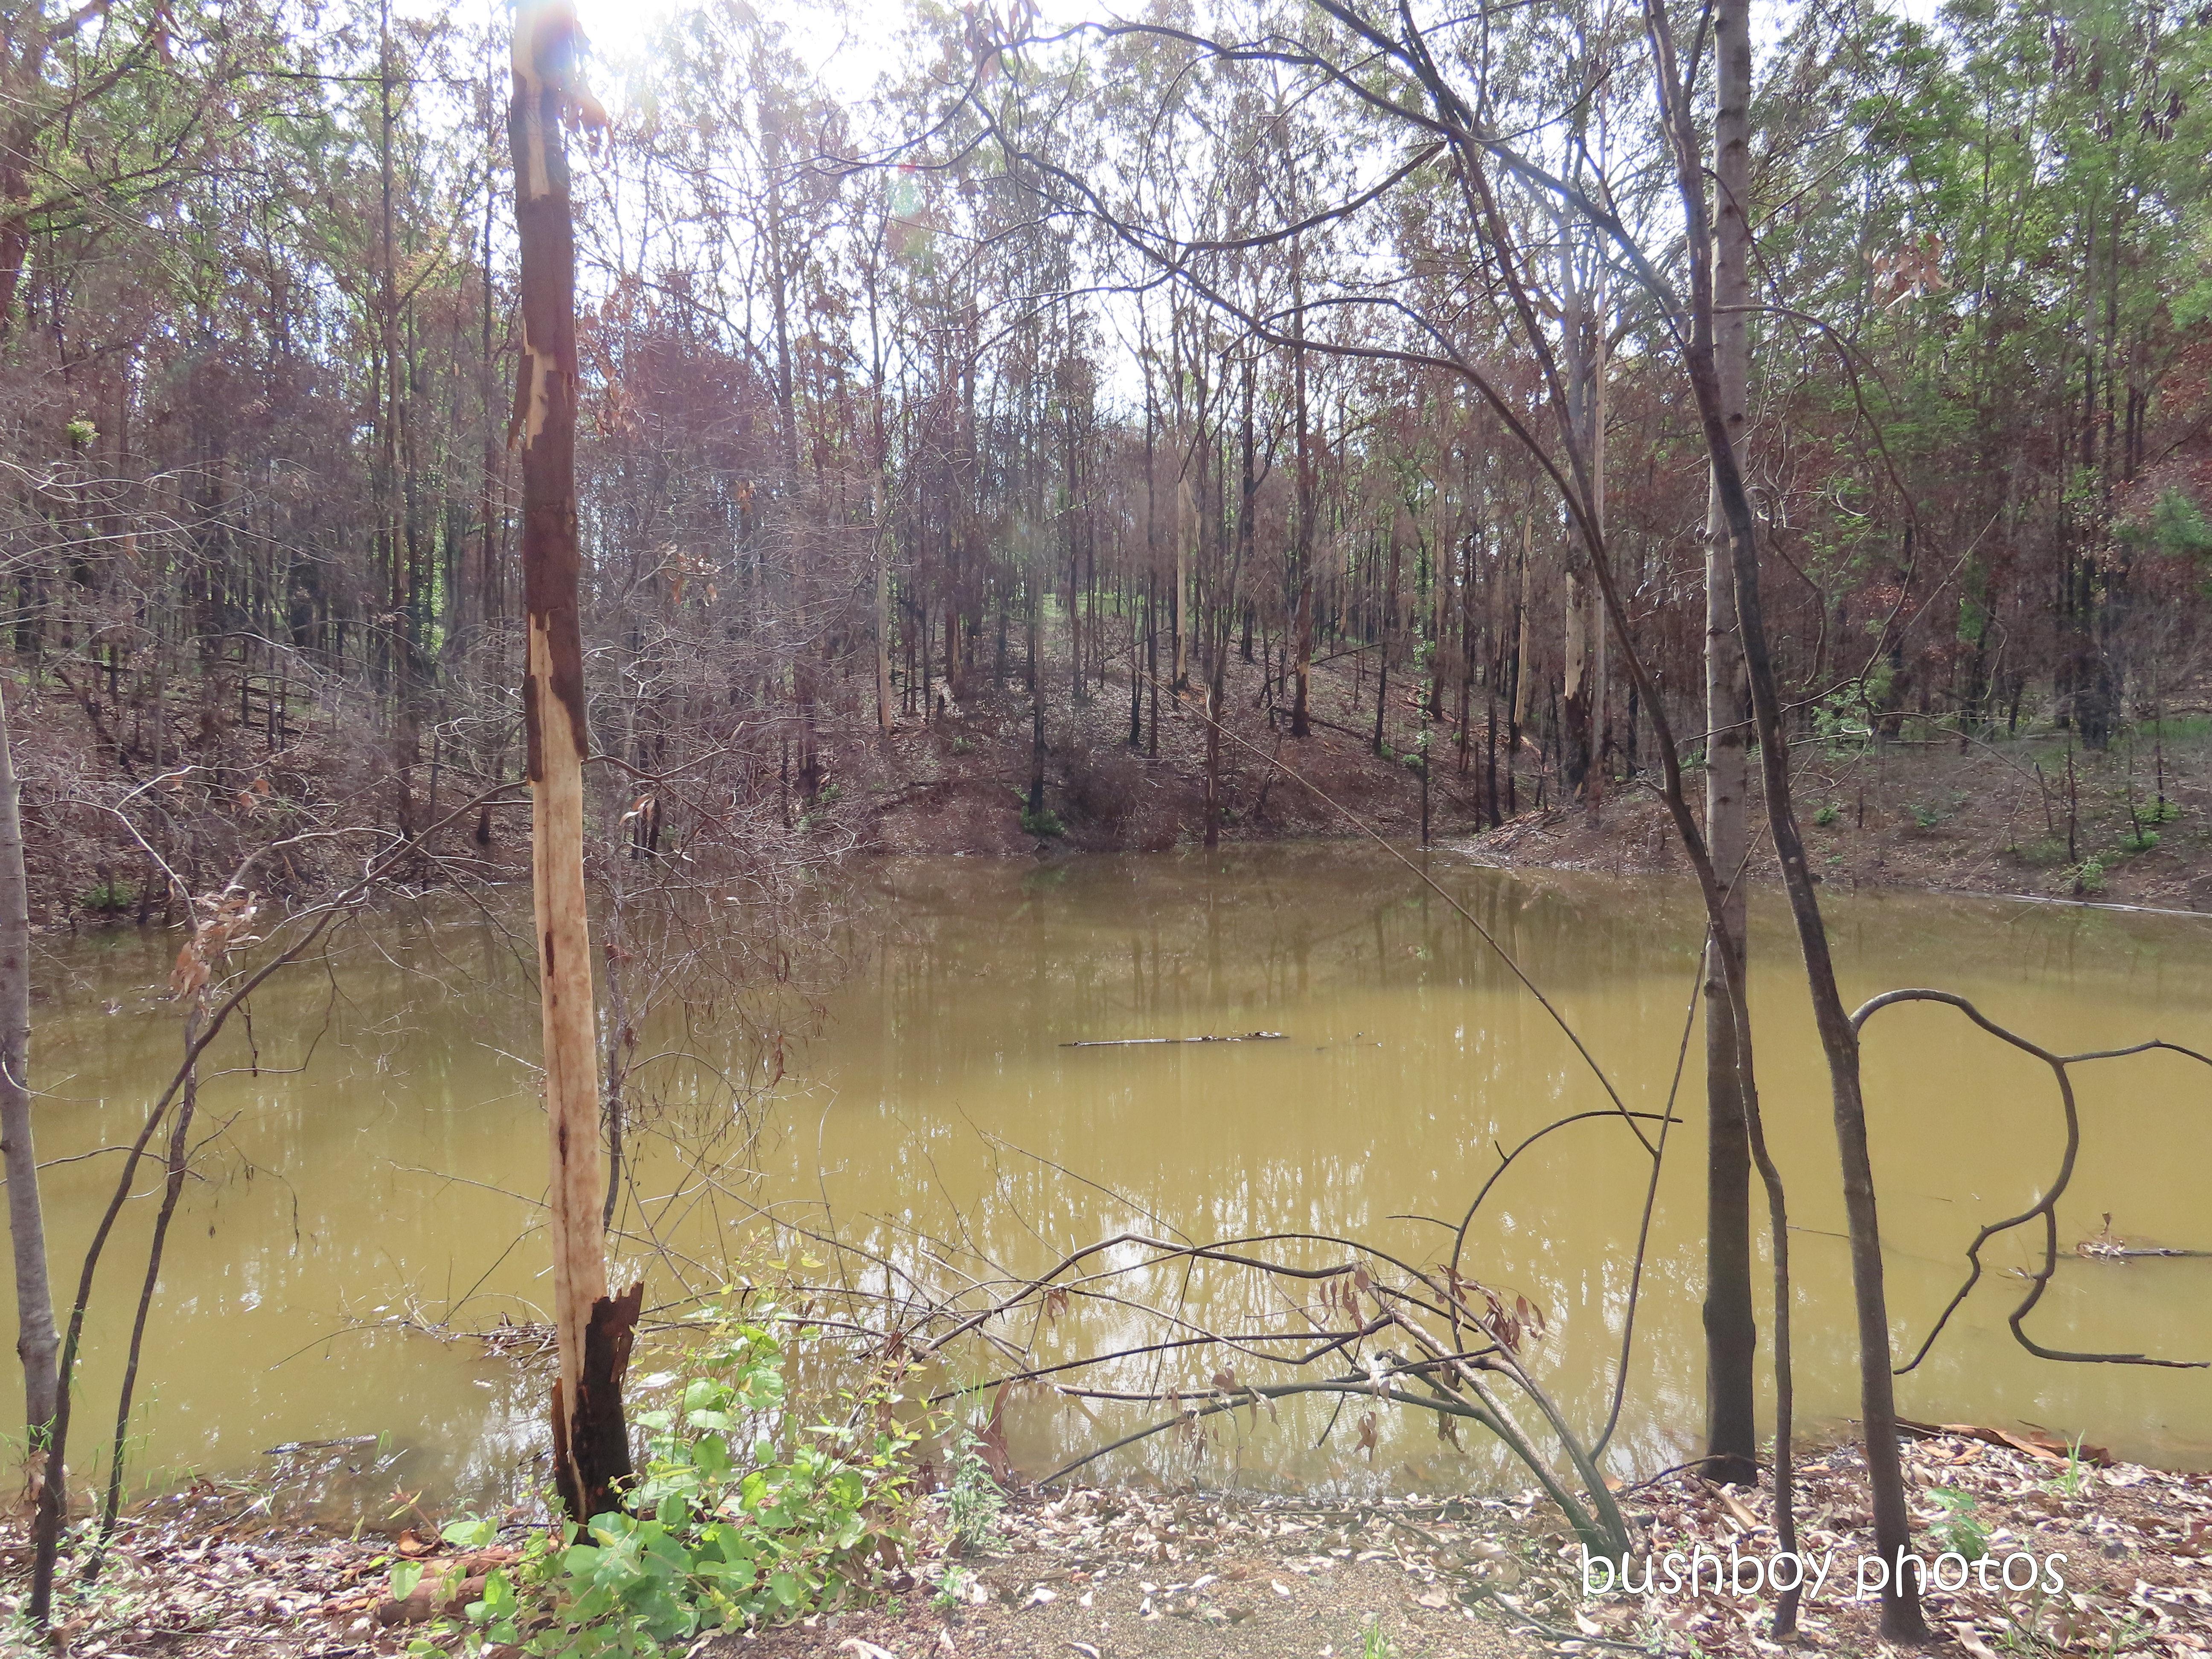 20200211_blog challenge_water water_big dam_full_home